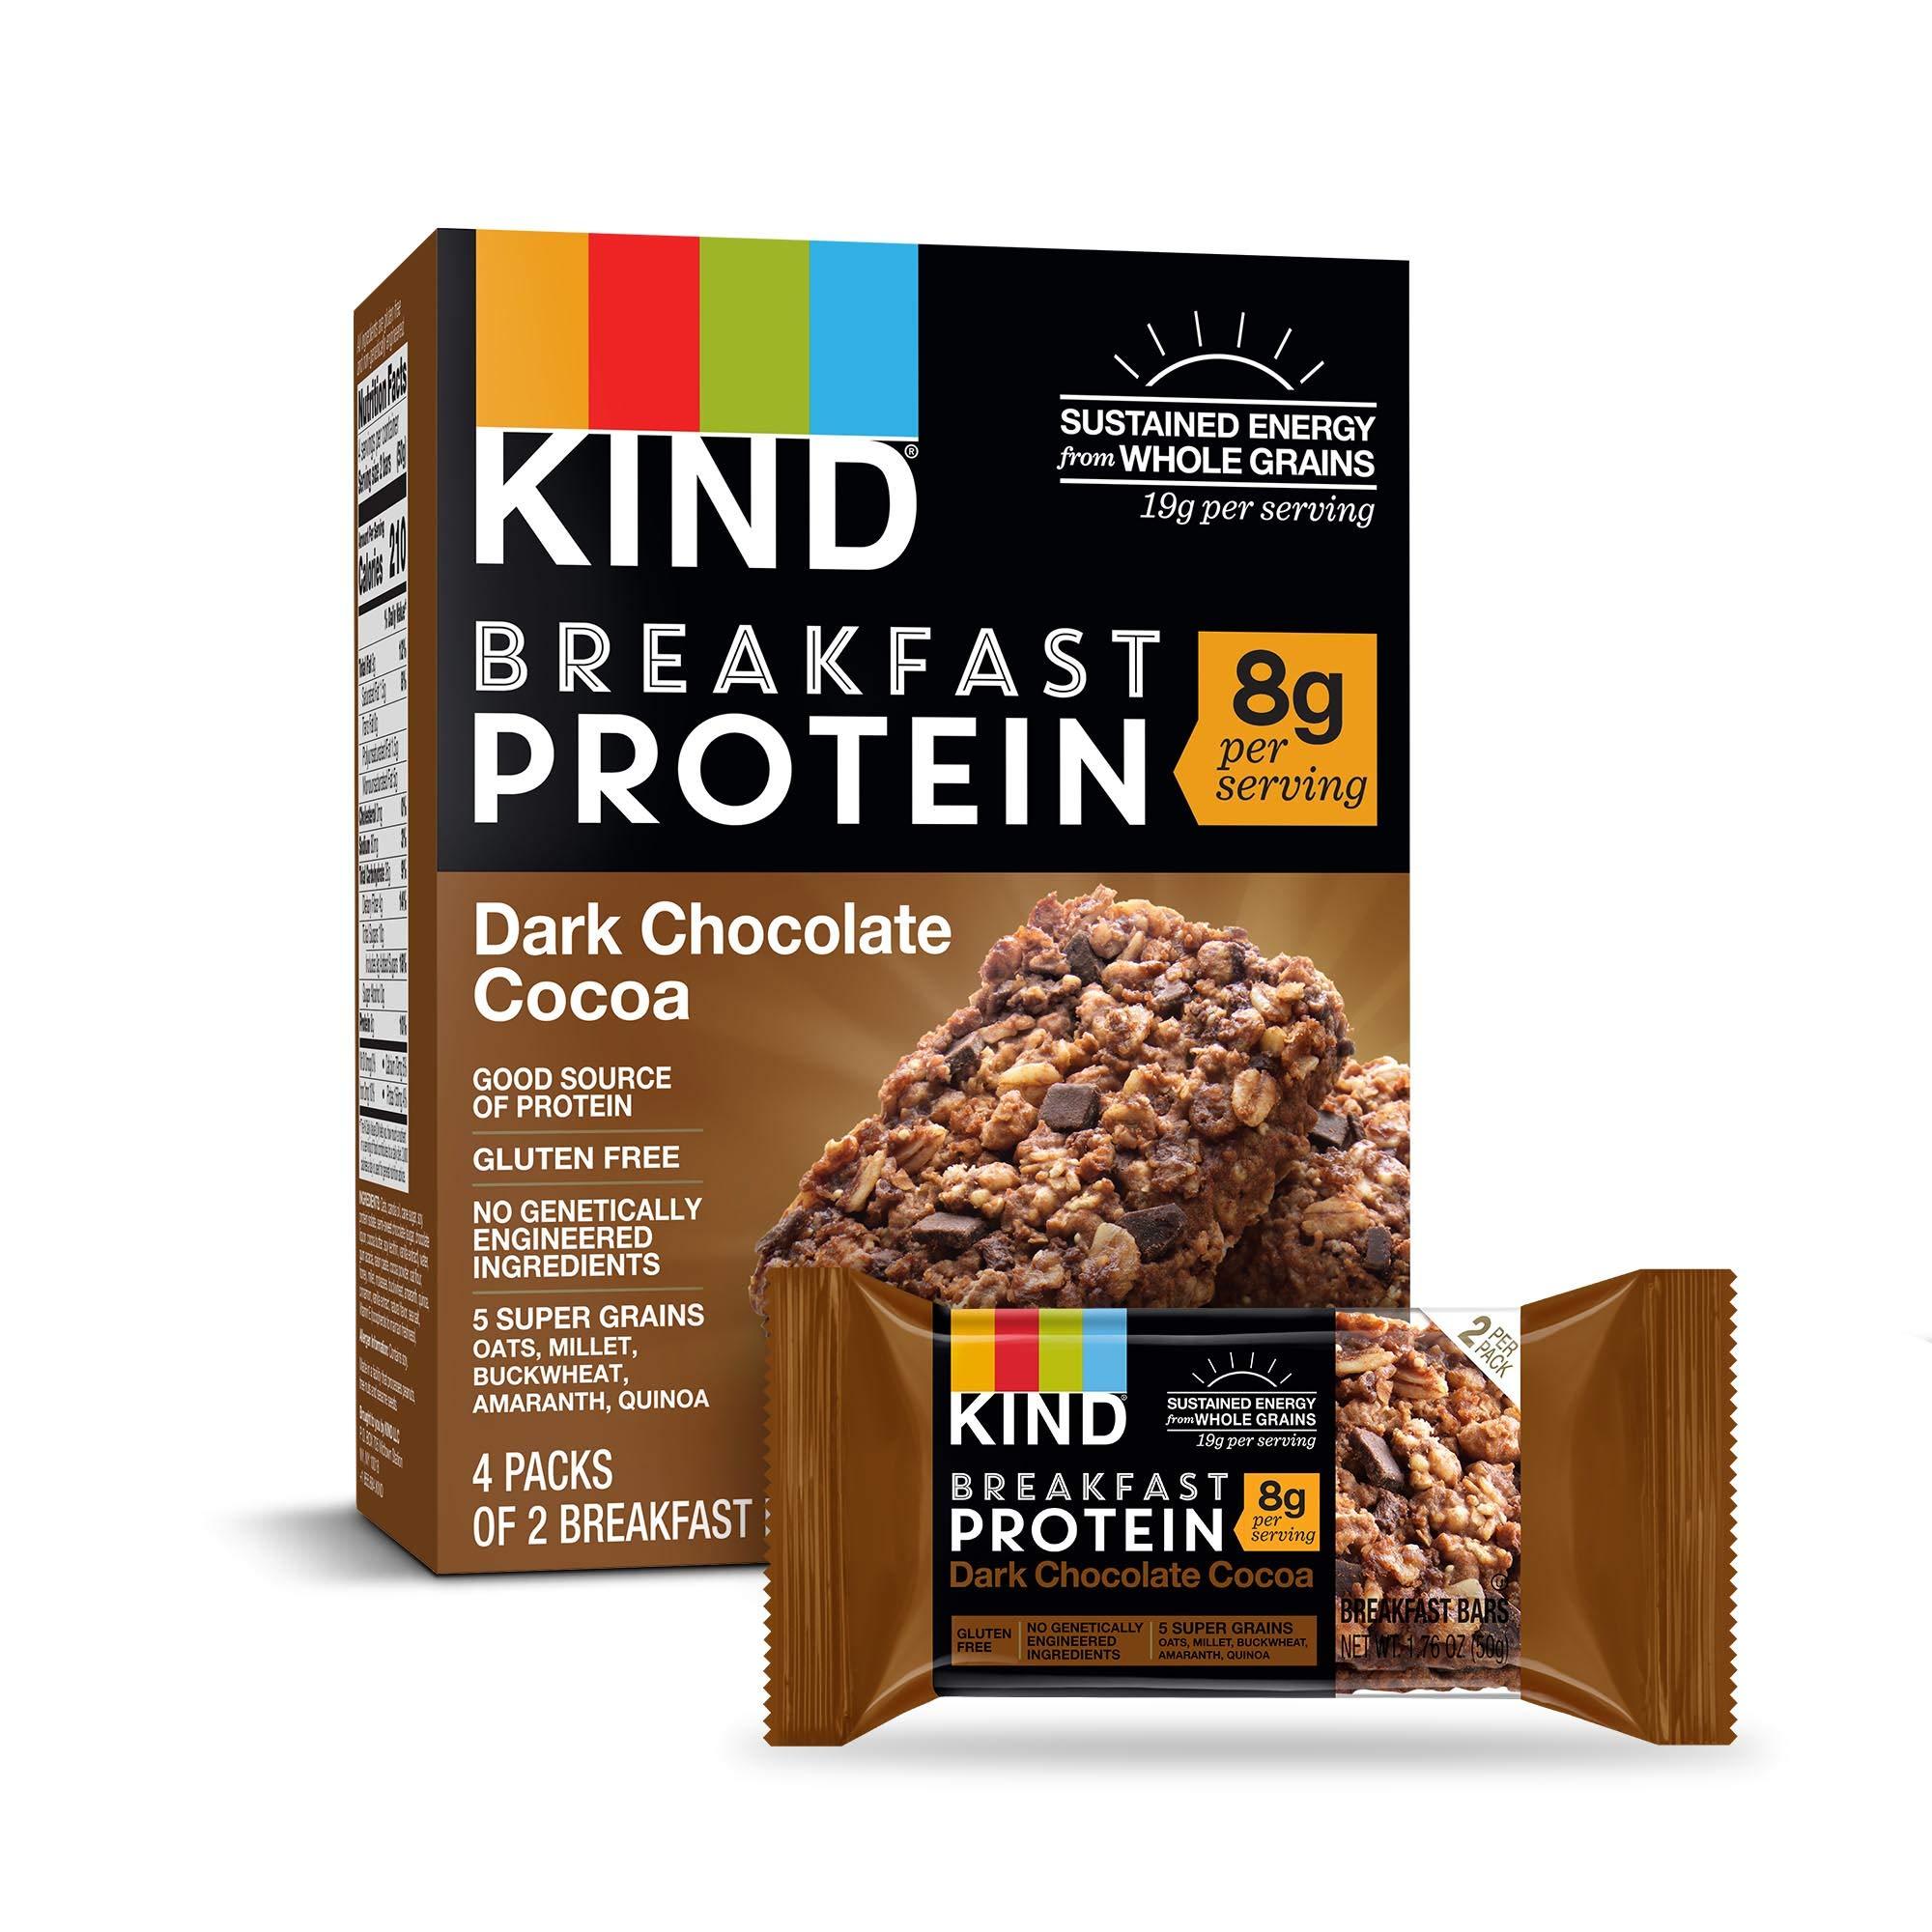 KIND Breakfast Bars, Dark Chocolate Cocoa, Gluten Free, 1.8oz, 32 Count